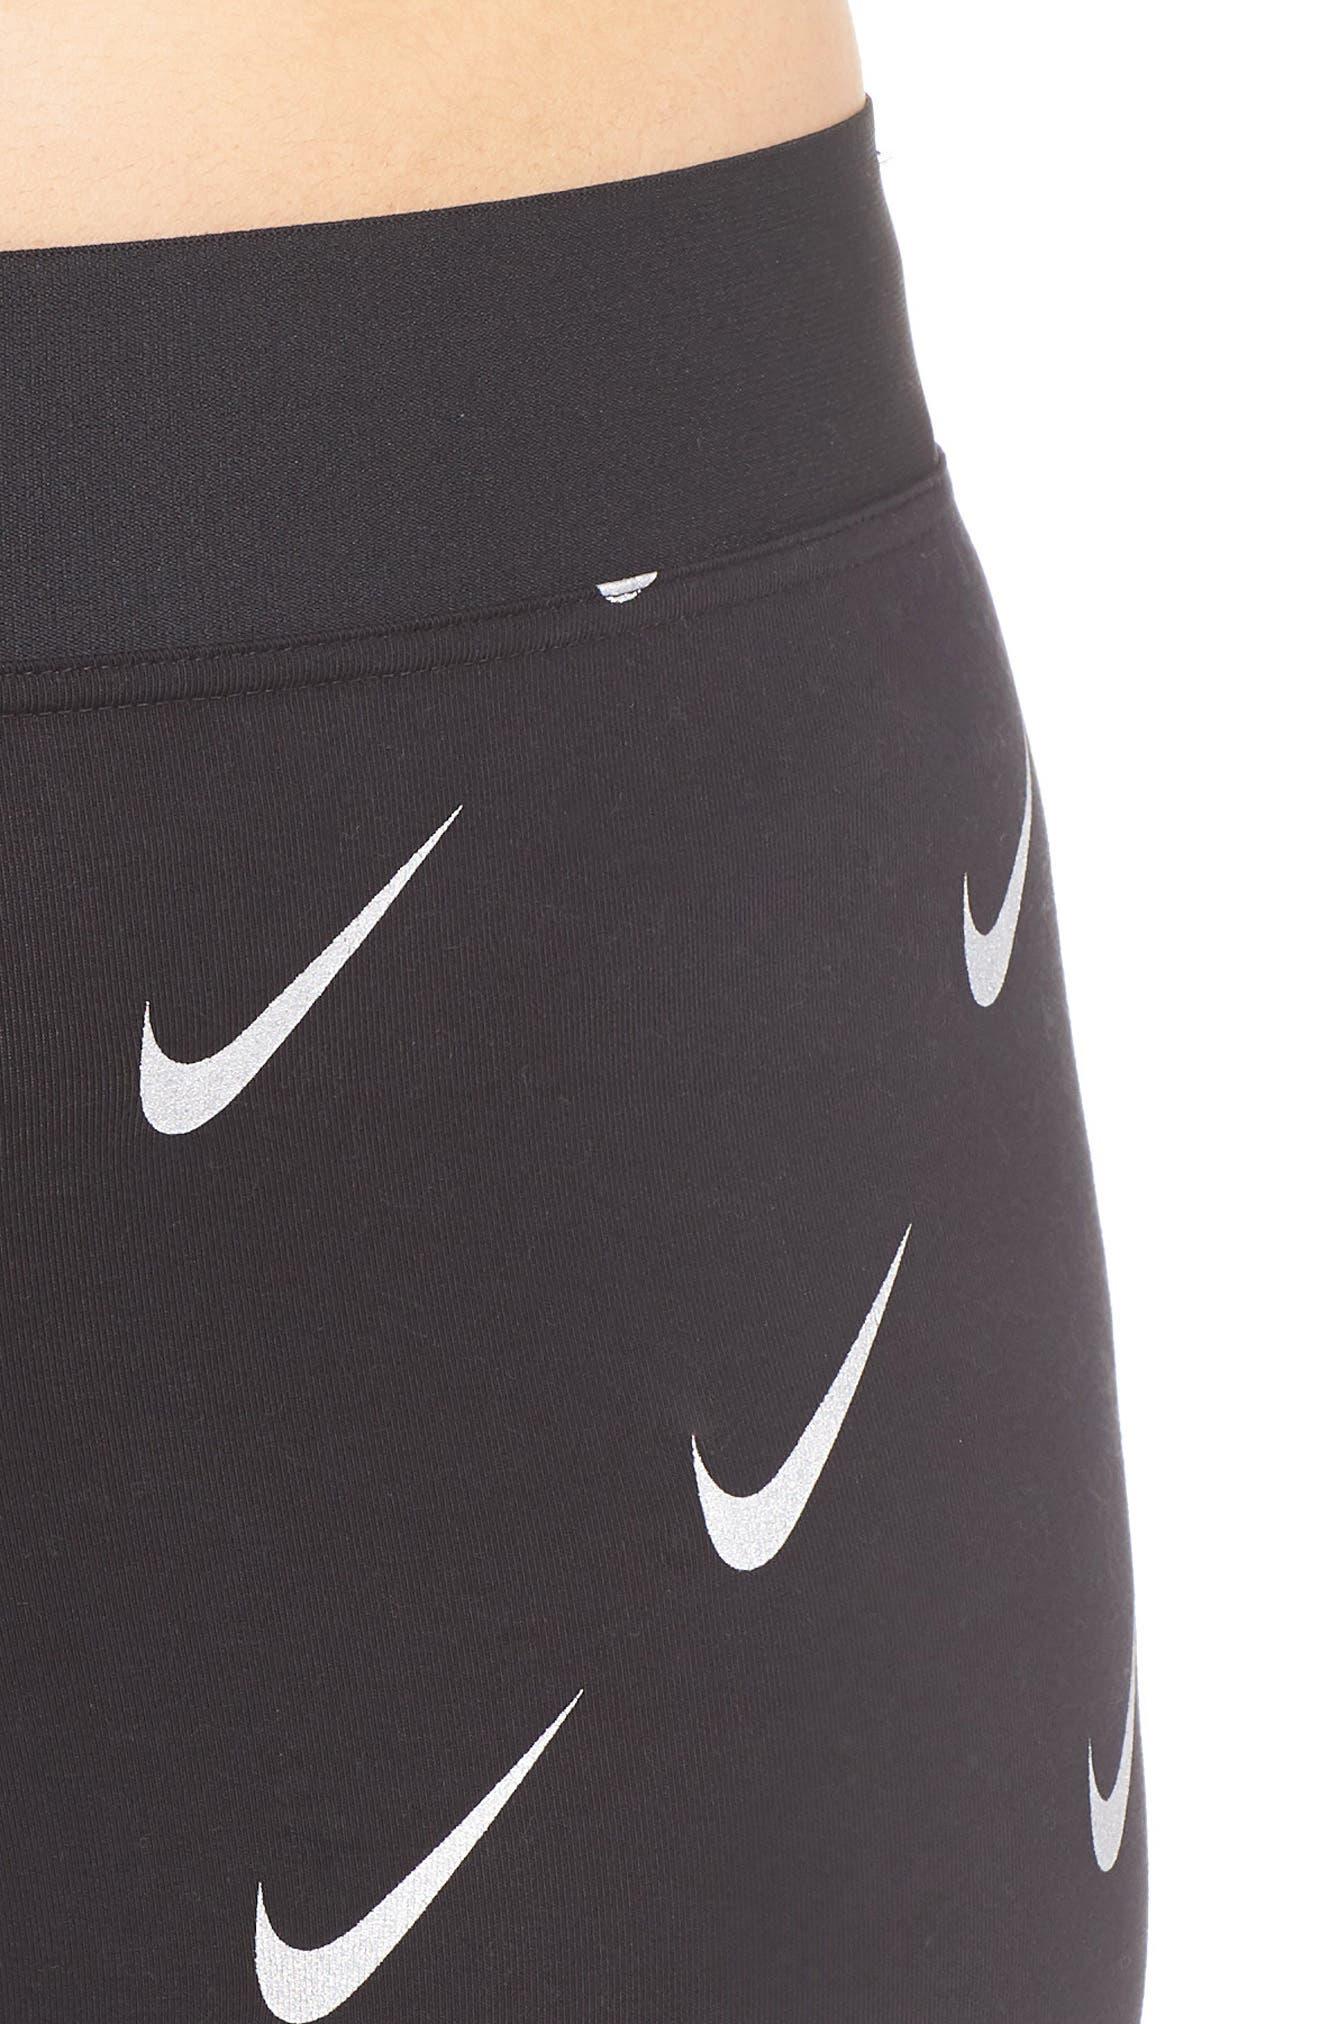 Sportswear Leg-A-See High Rise Print Leggings,                             Alternate thumbnail 4, color,                             BLACK